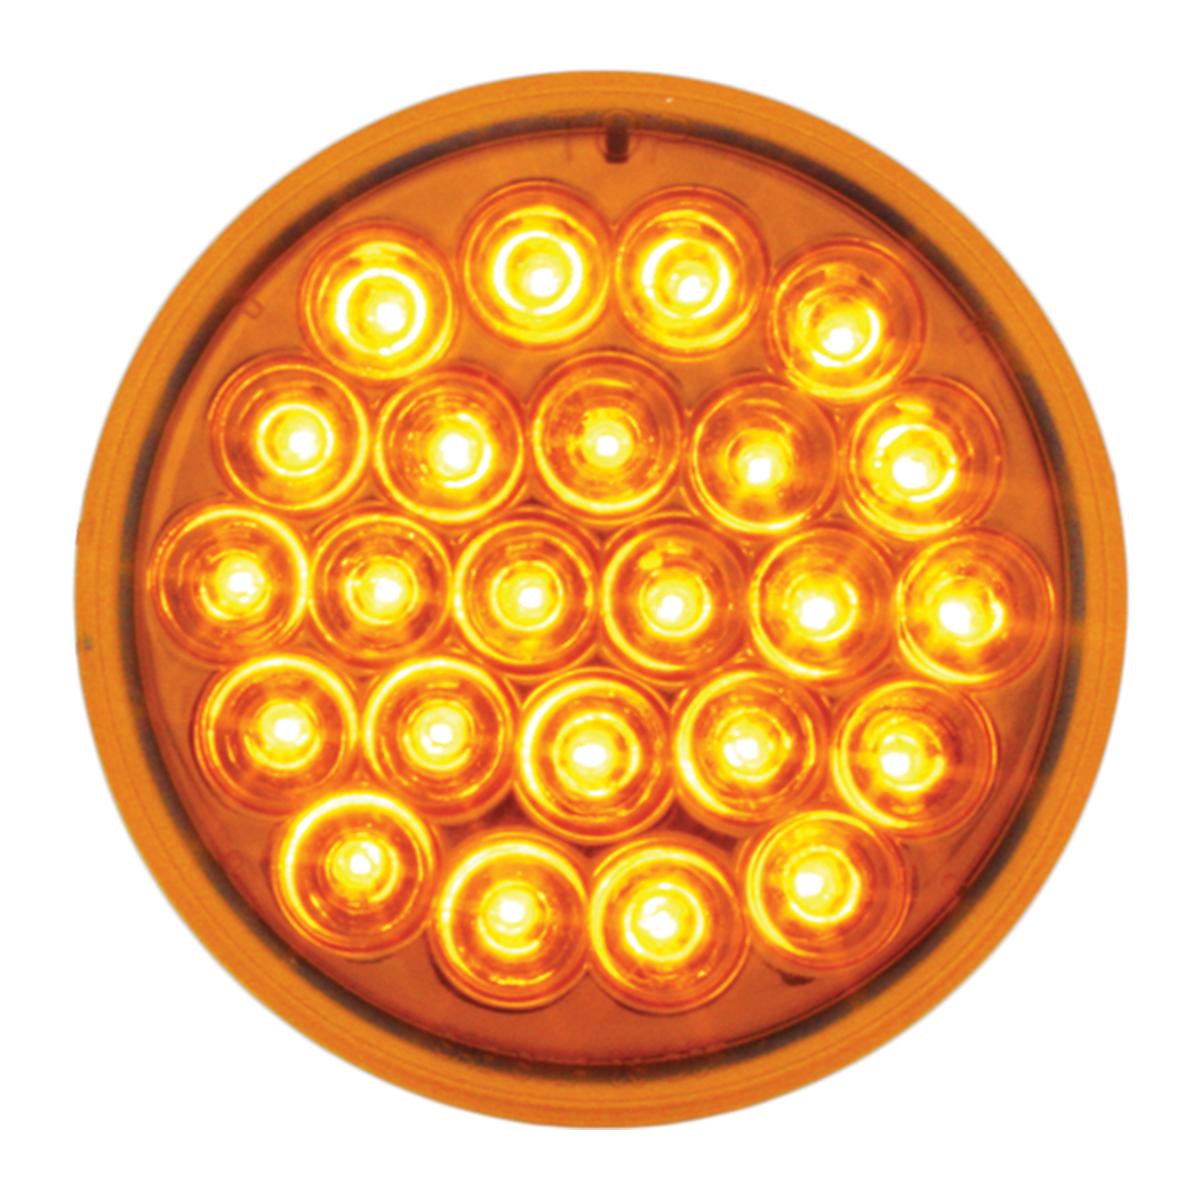 "#78270 4"" Round Pearl LED Flat Amber/Amber Light"